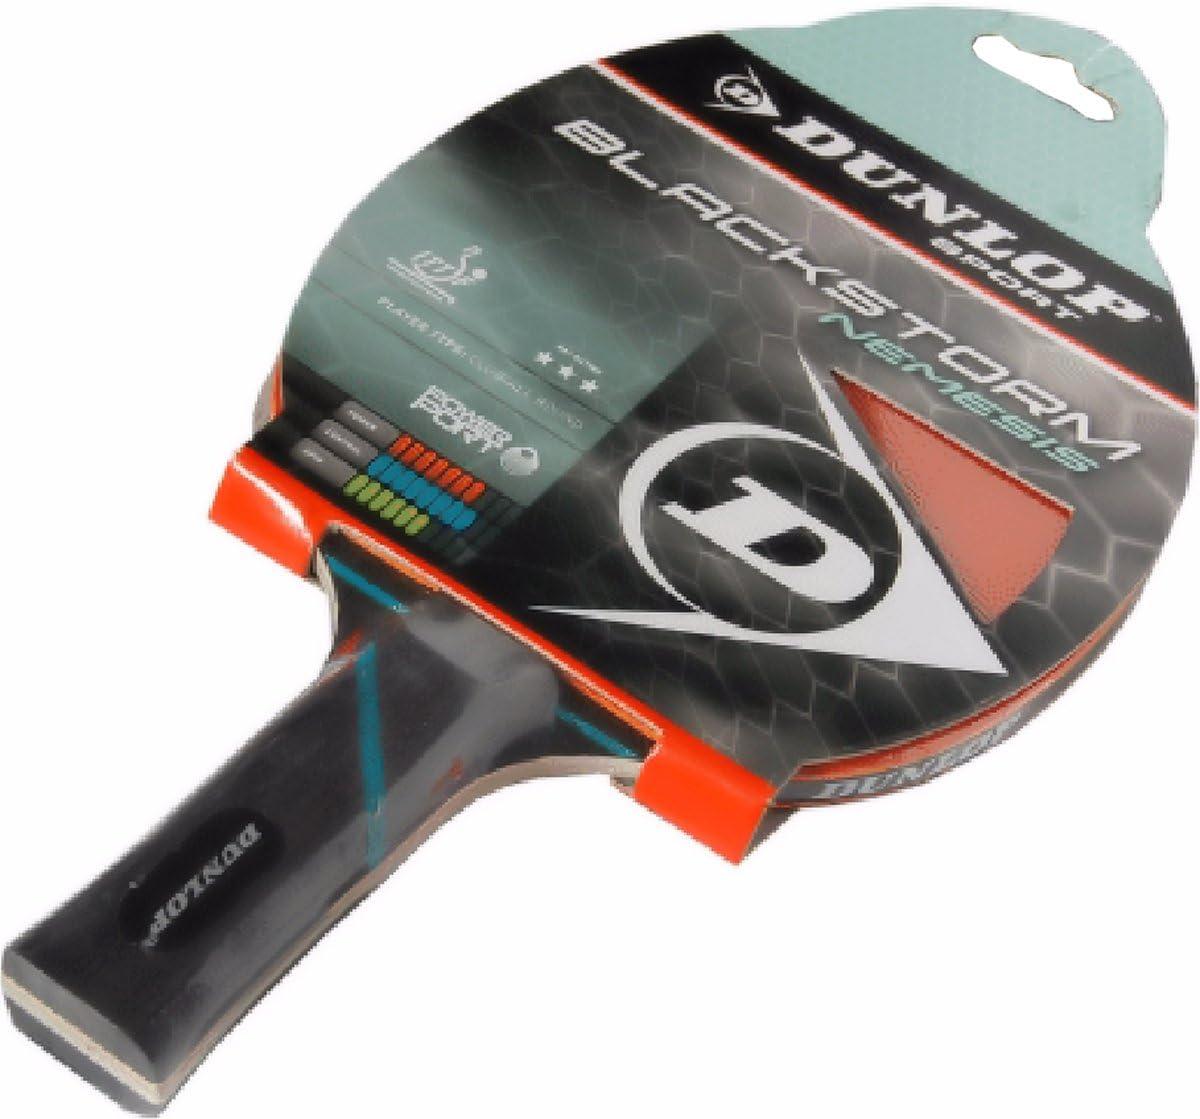 Amazon.com: Dunlop Blackstorm Nemesis Bate de tenis de mesa ...